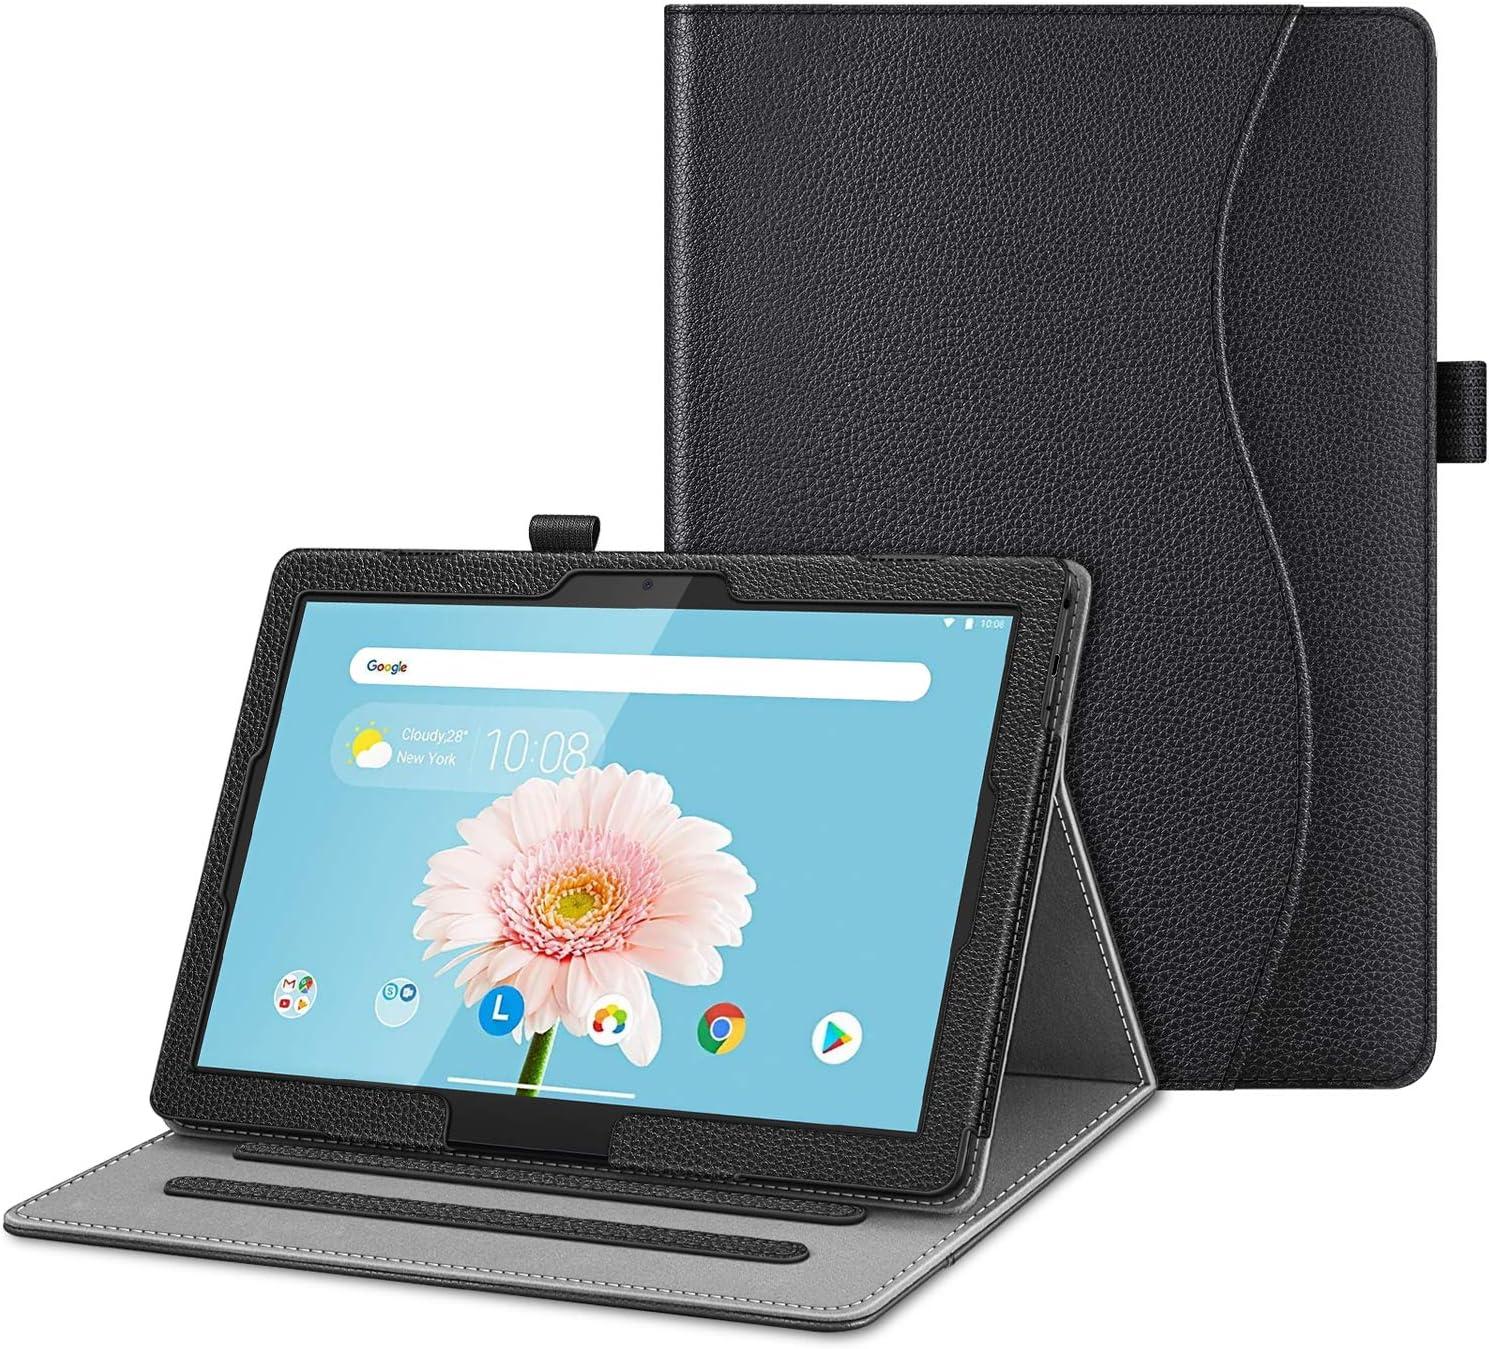 "Fintie Case for Lenovo Smart Tab M10 HD / P10 / M10, Multi-Angle Viewing Folio Cover w/Pocket, Auto Wake/Sleep for Lenovo Tab M10 HD TB-X505F/P10 TB-X705F TB-X705L / M10 TB-X605F 10.1"" Tablet, Black"